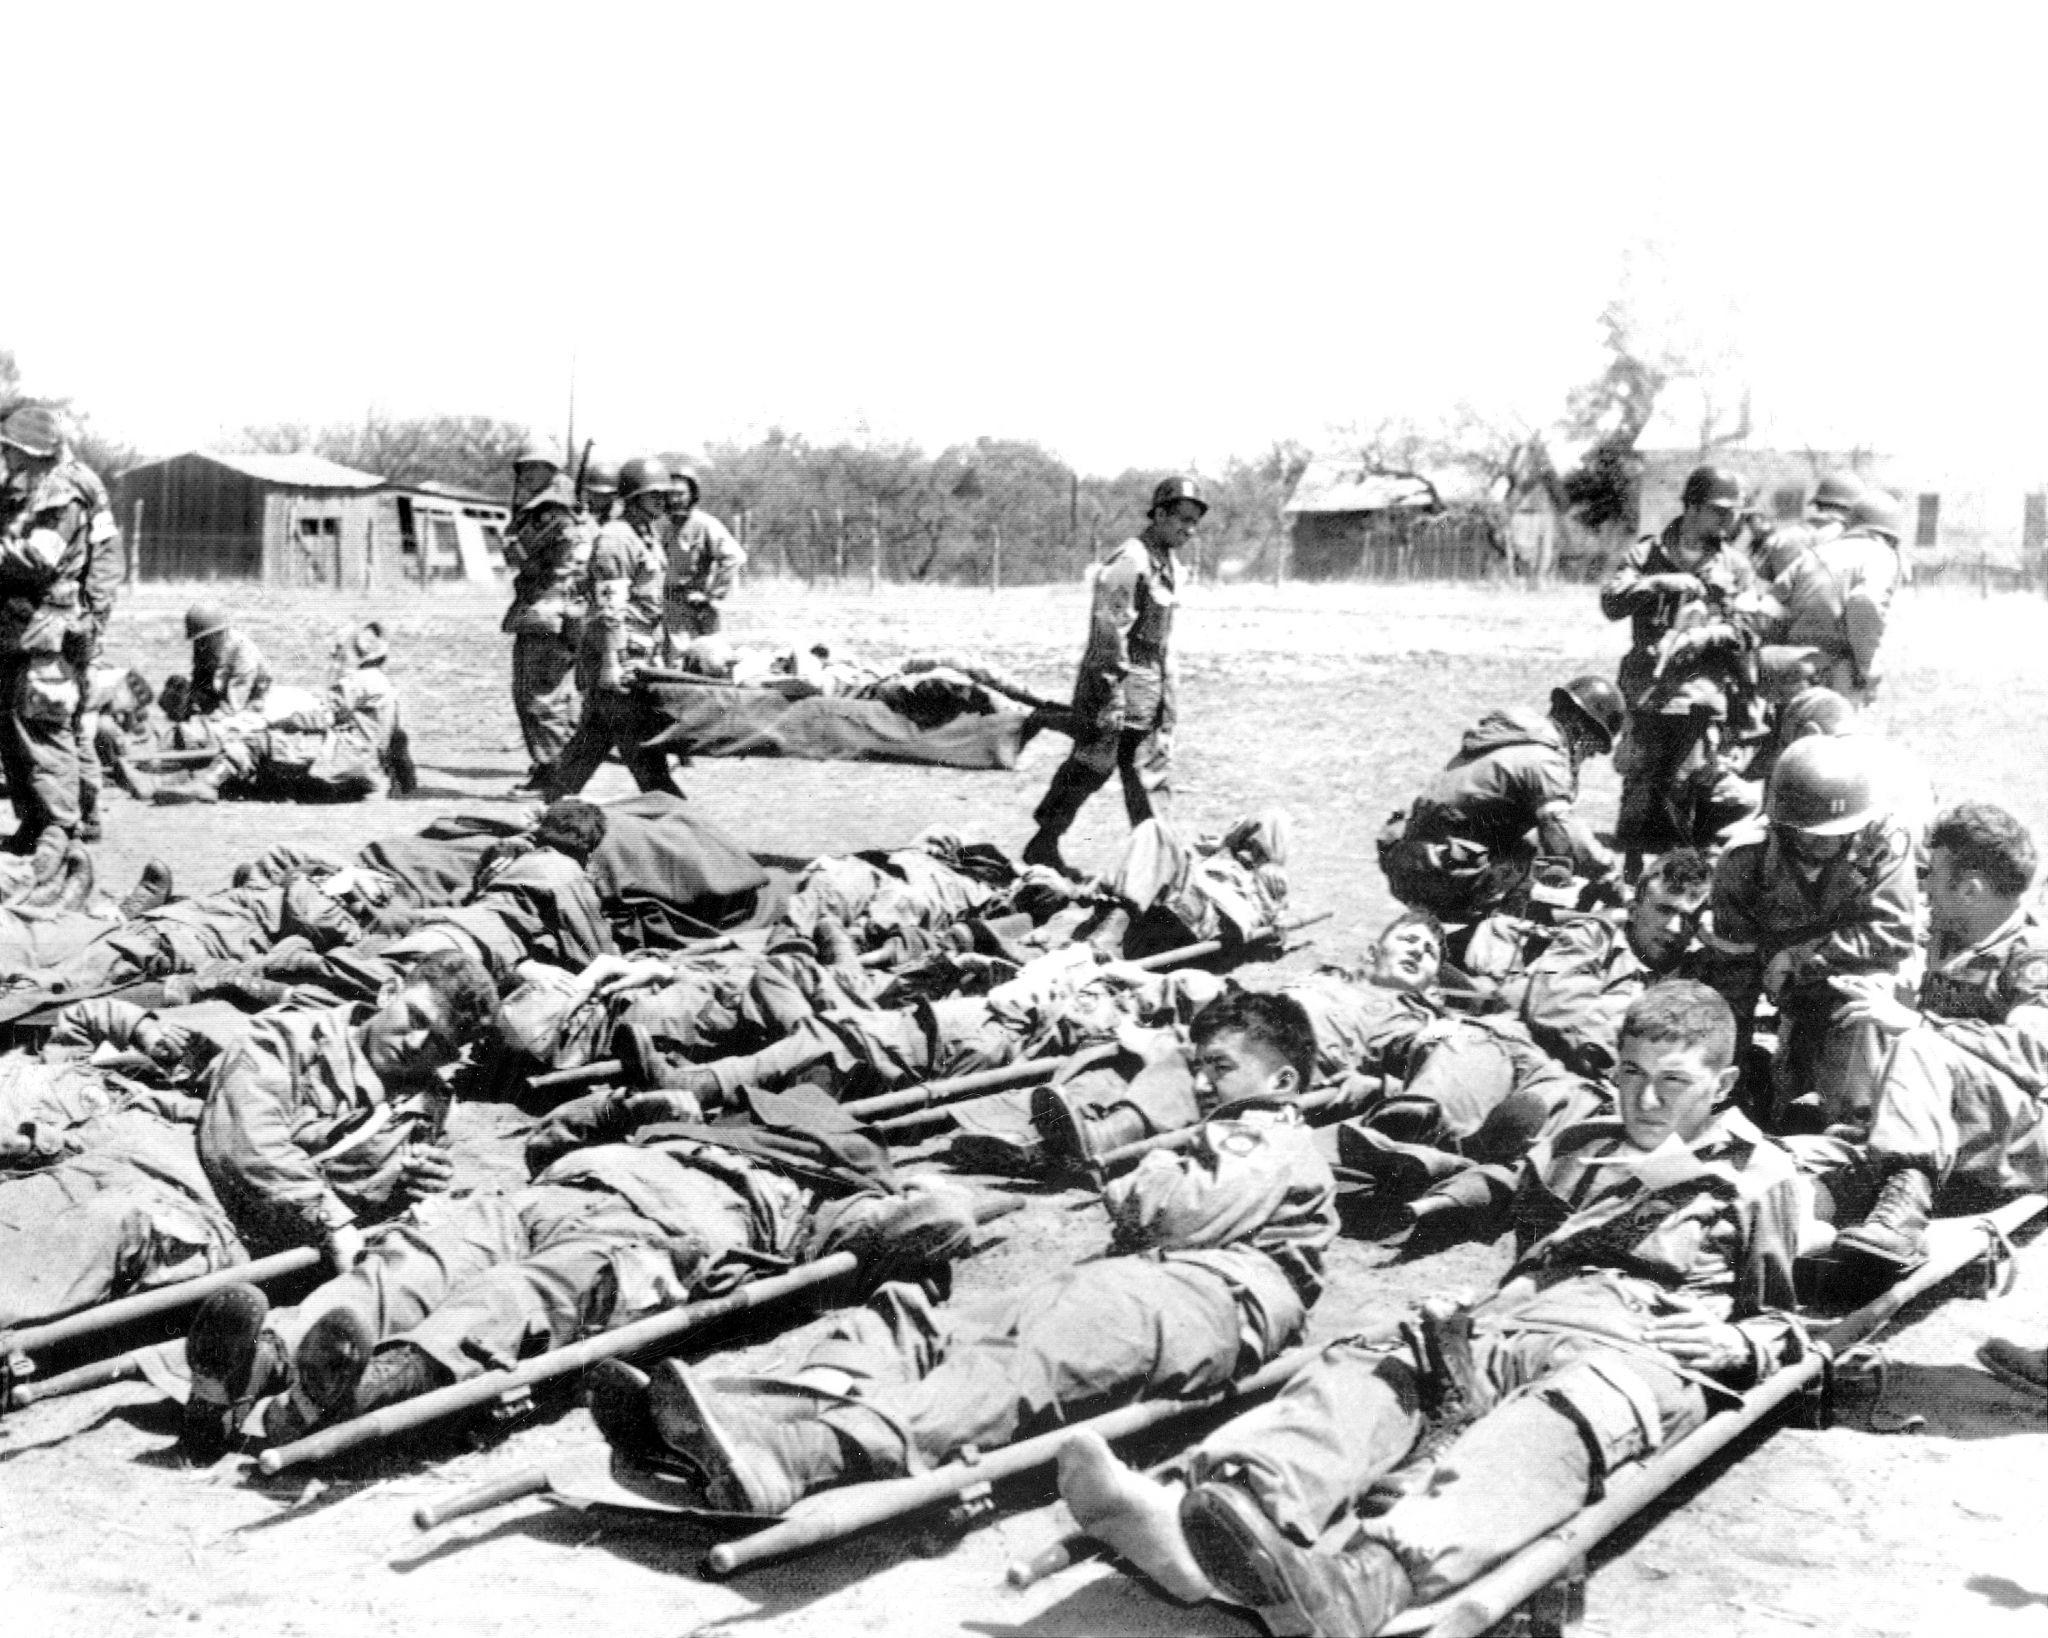 Texas' lost communist 'invasion' of 1952